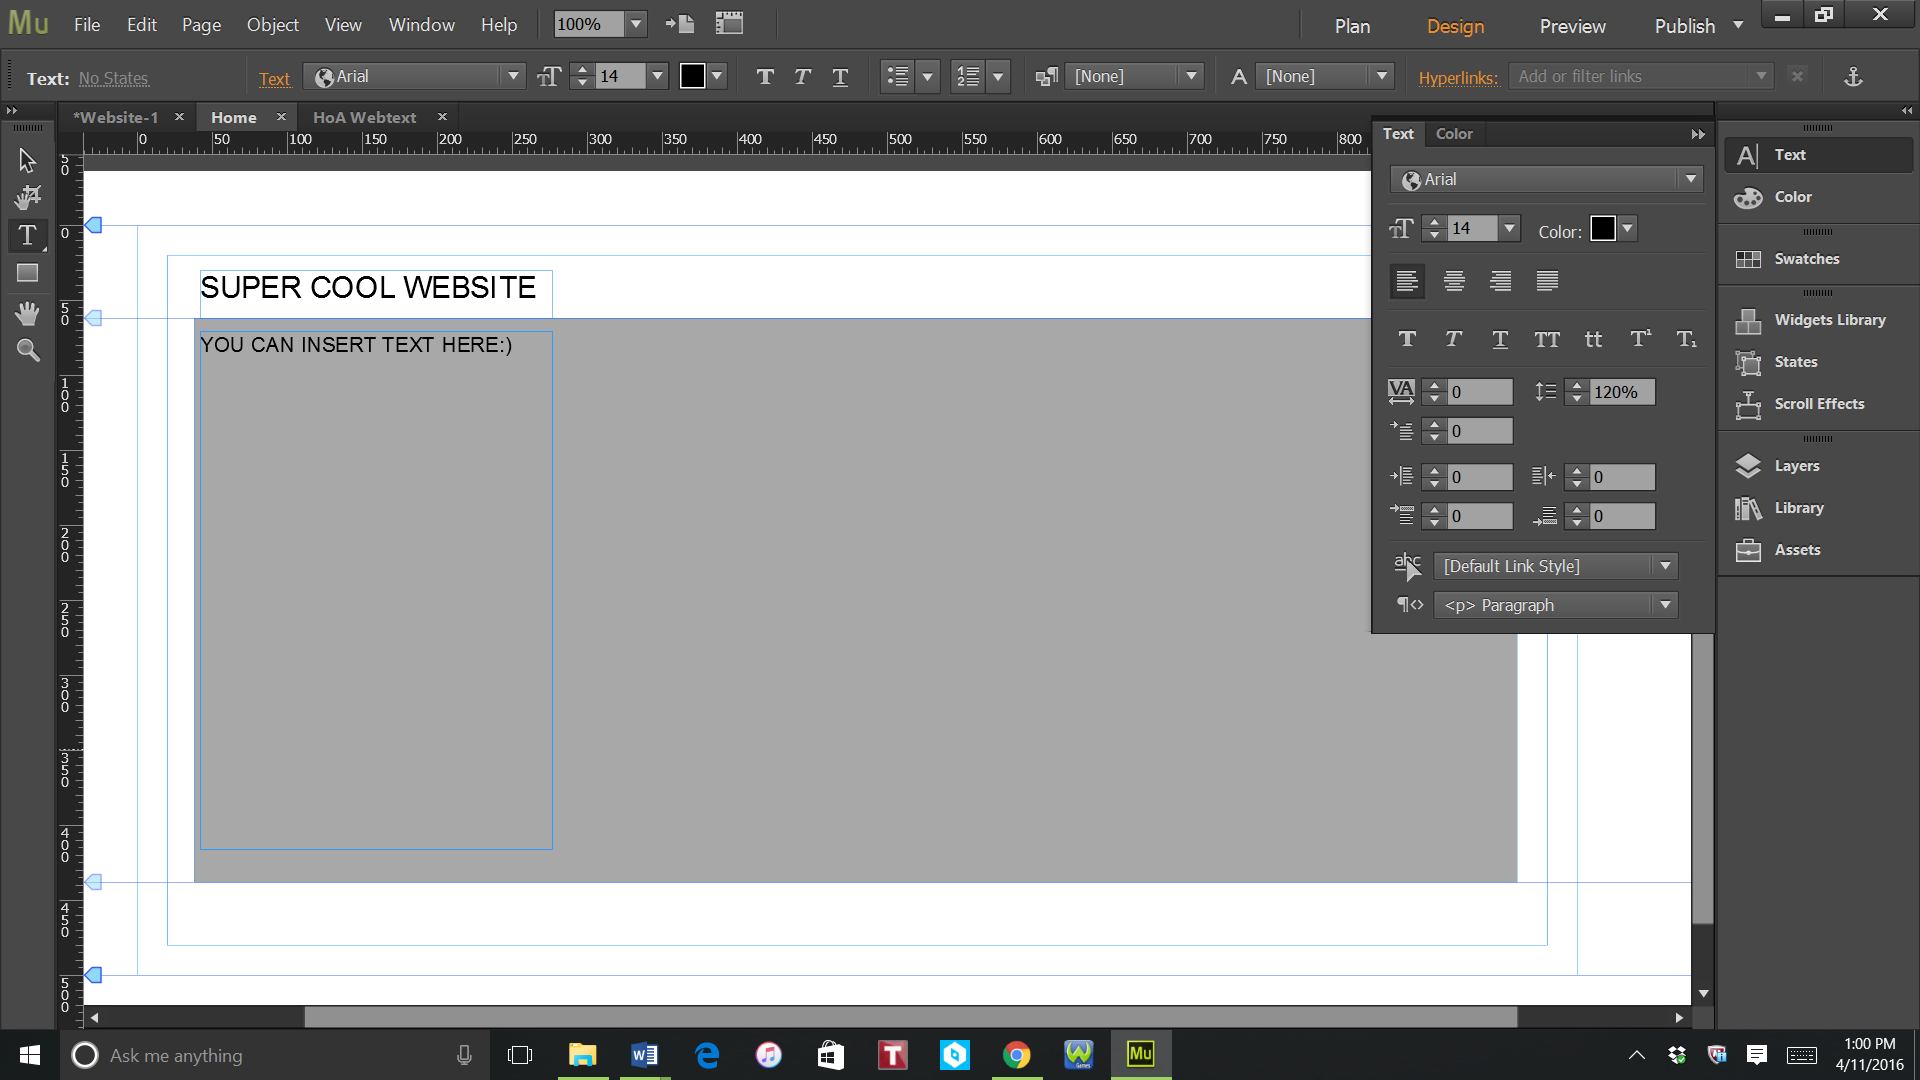 Adobe muse tutorial by ashley rea infographic adobe muse created with raphal 212 created with raphal 212 baditri Choice Image